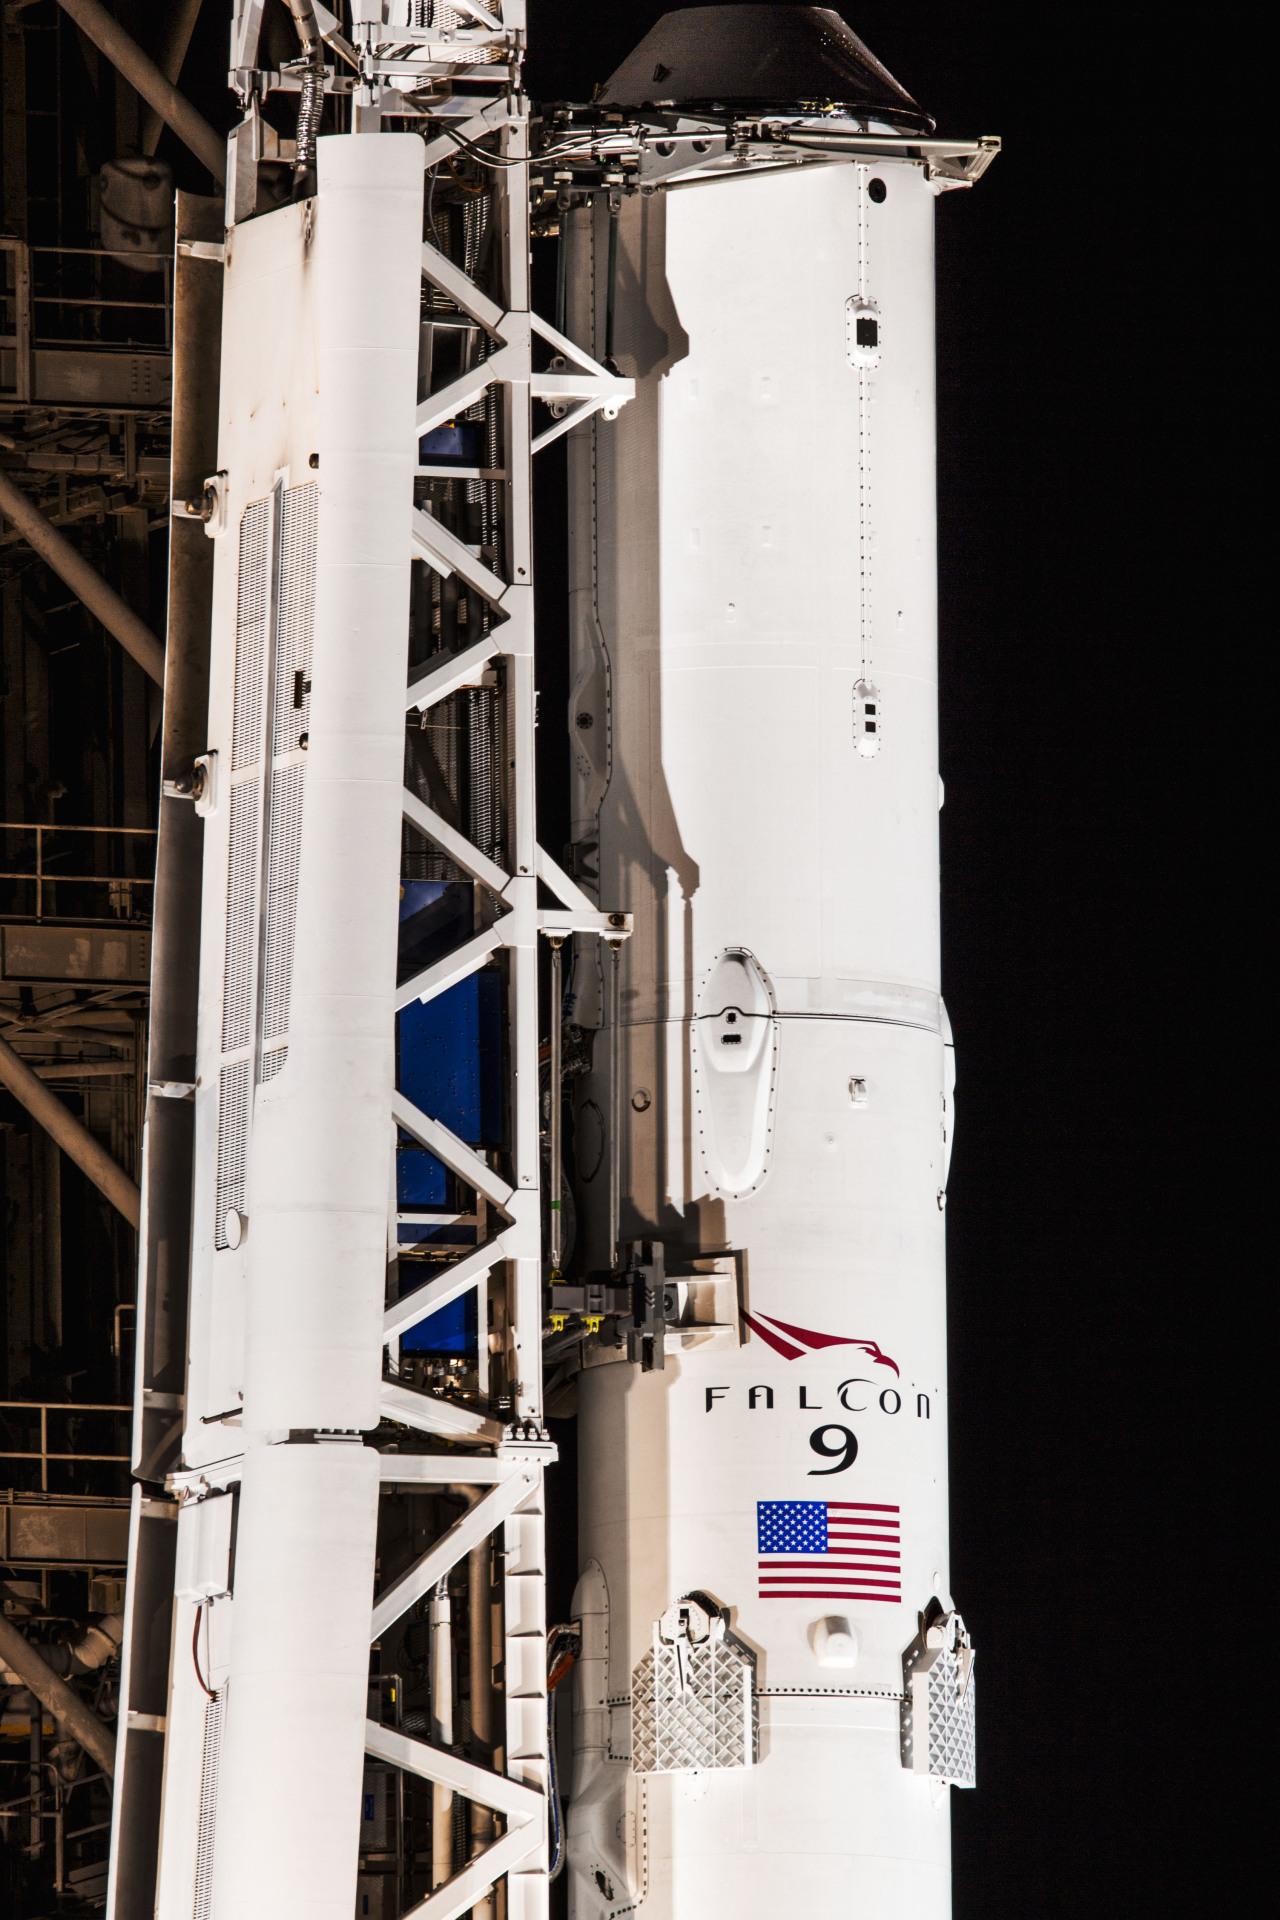 Falcon-9 (CRS-10) - 19.02.17  [Succès] - Page 3 Tumblr_ol6ztq3RMq1ttka3go3_1280